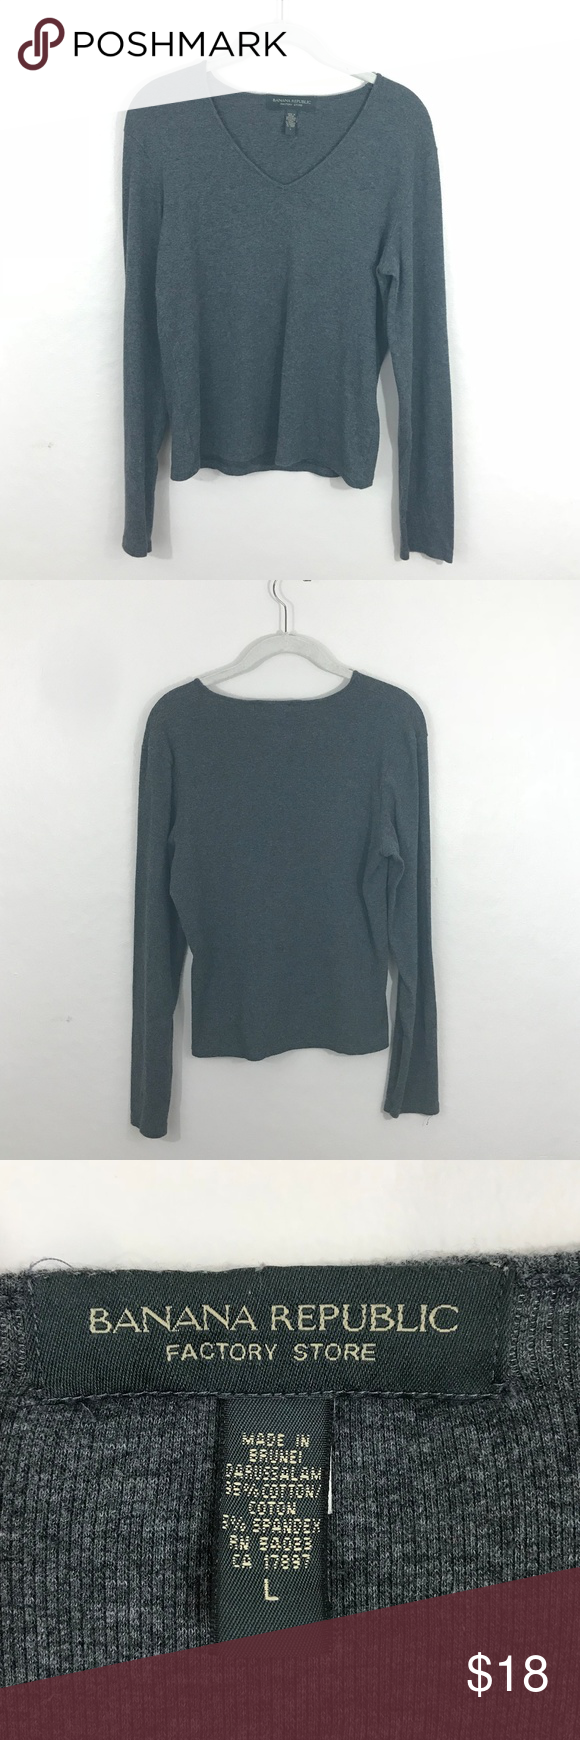 Banana Republic Factory Store Sweater Grey sweater, plain